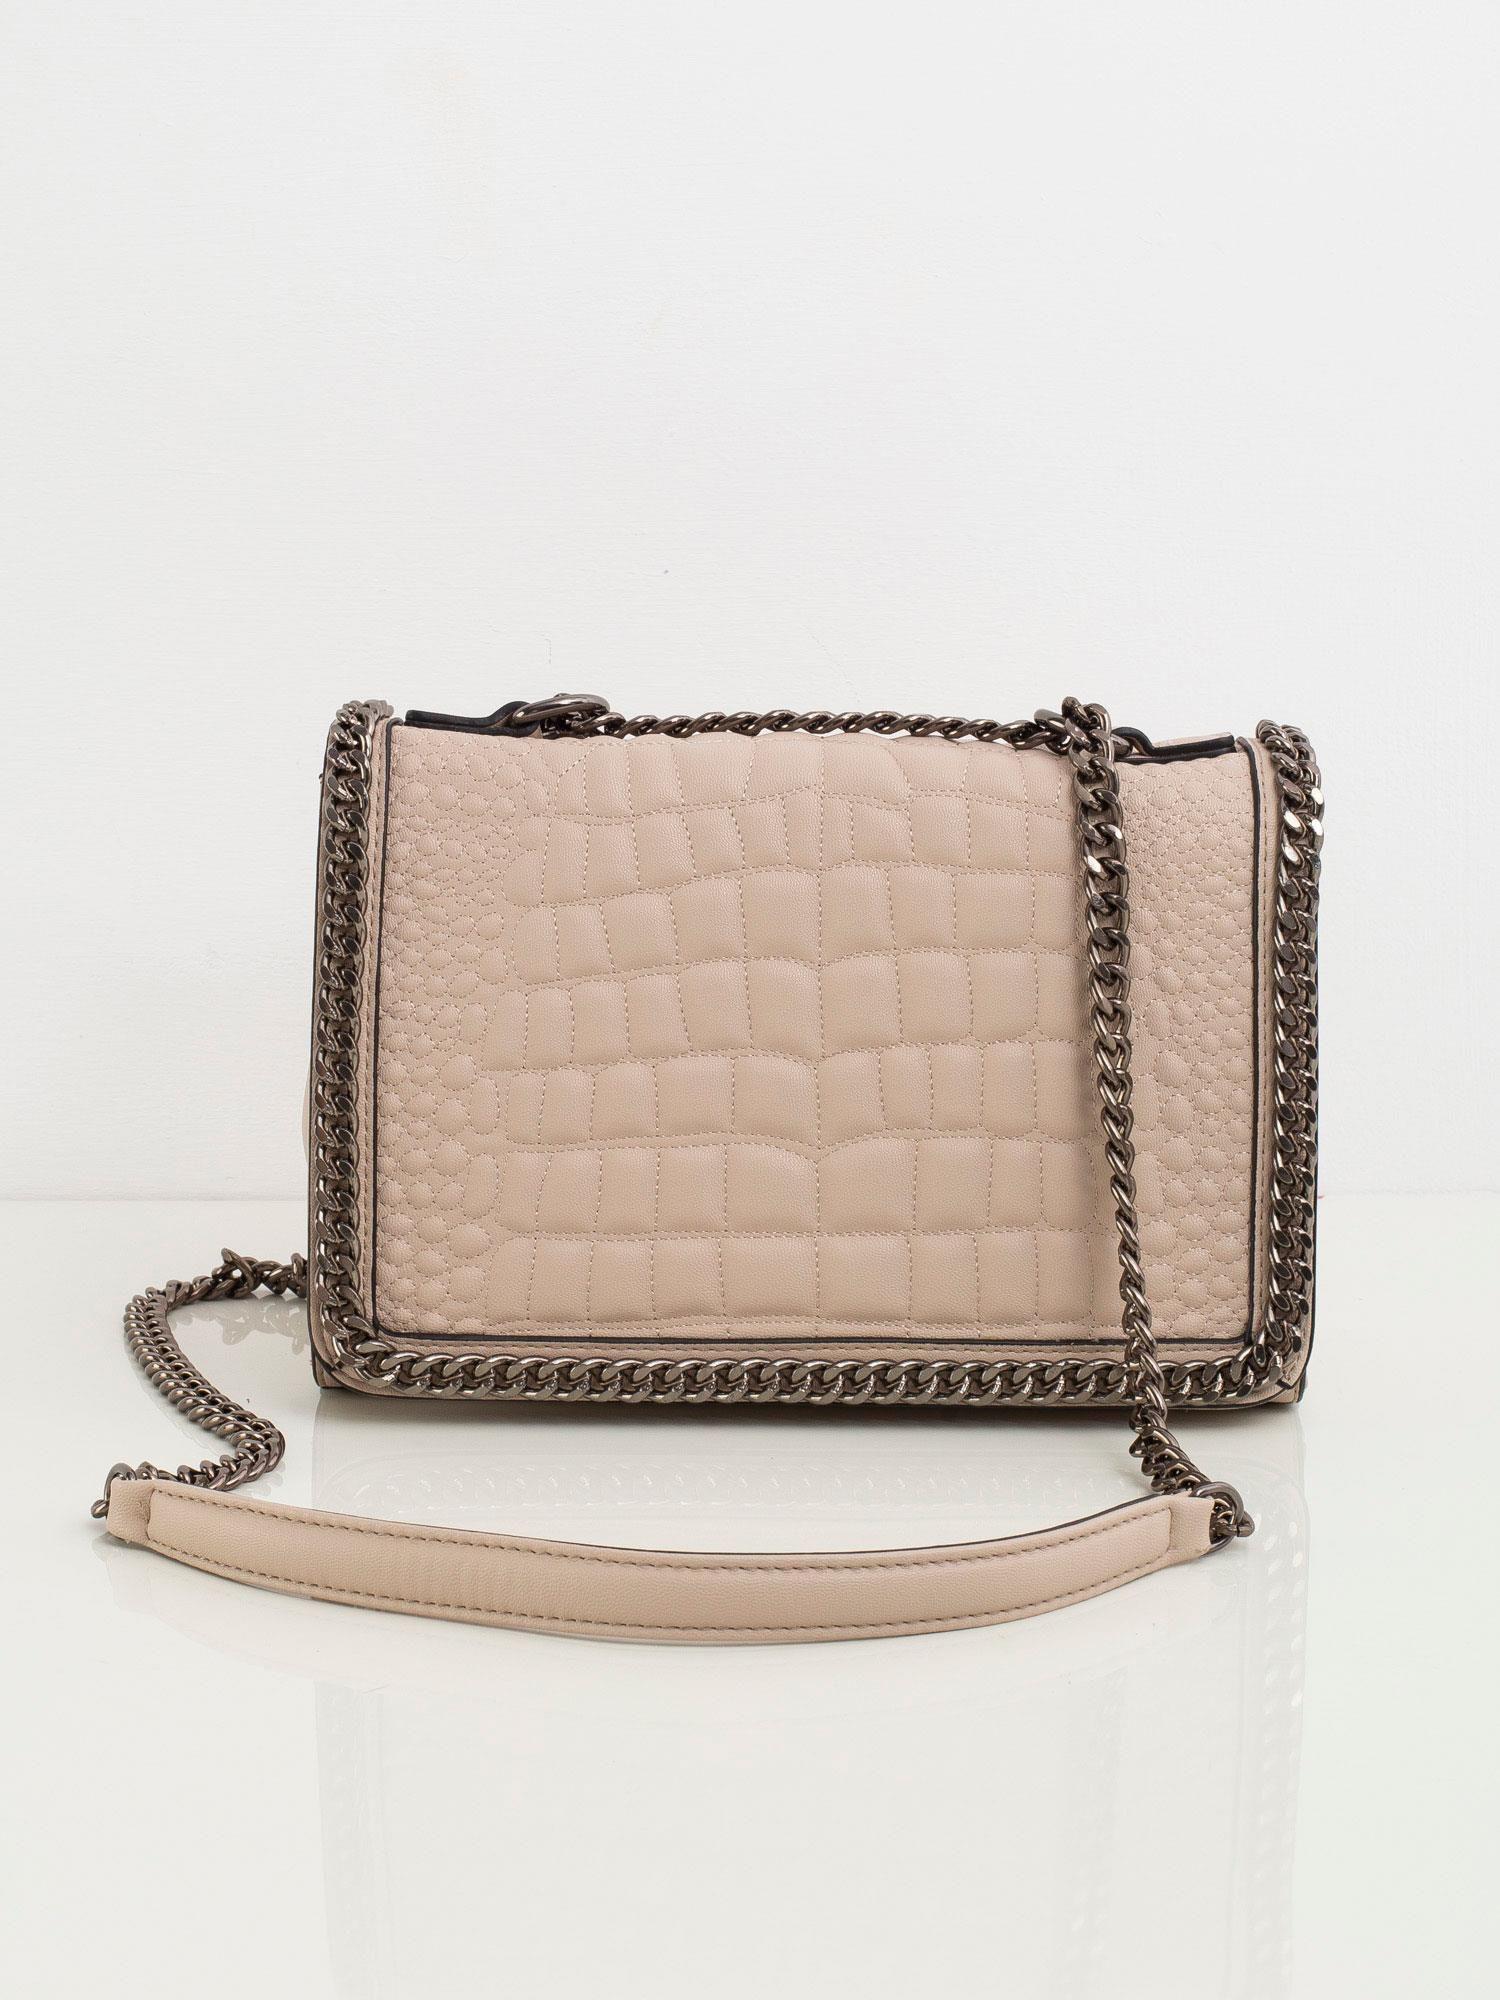 Béžová kabelka na rameno s retiazkou - UNI